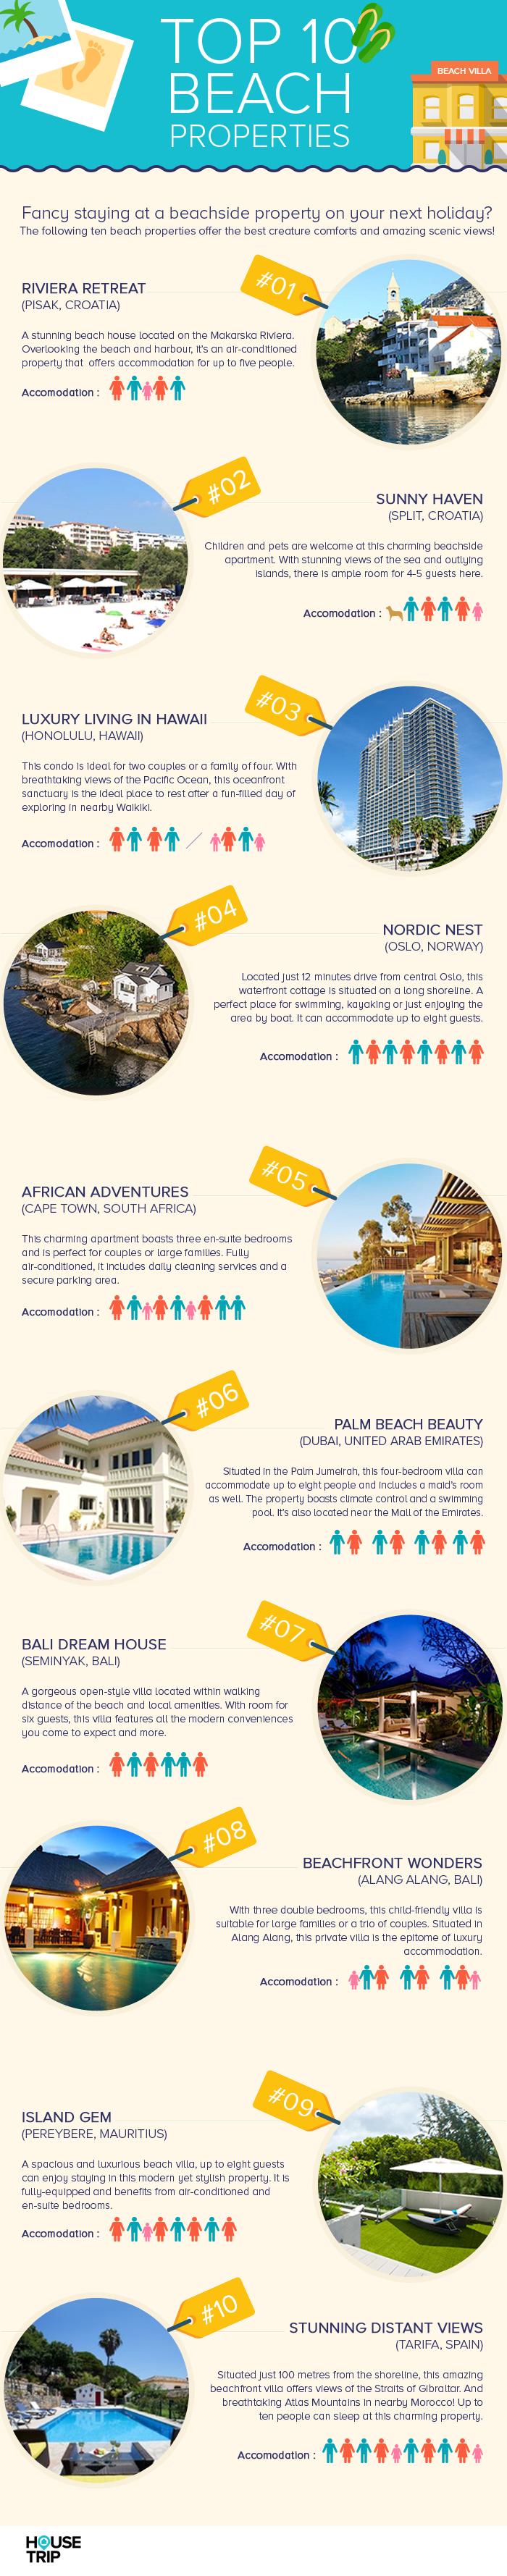 info-beach